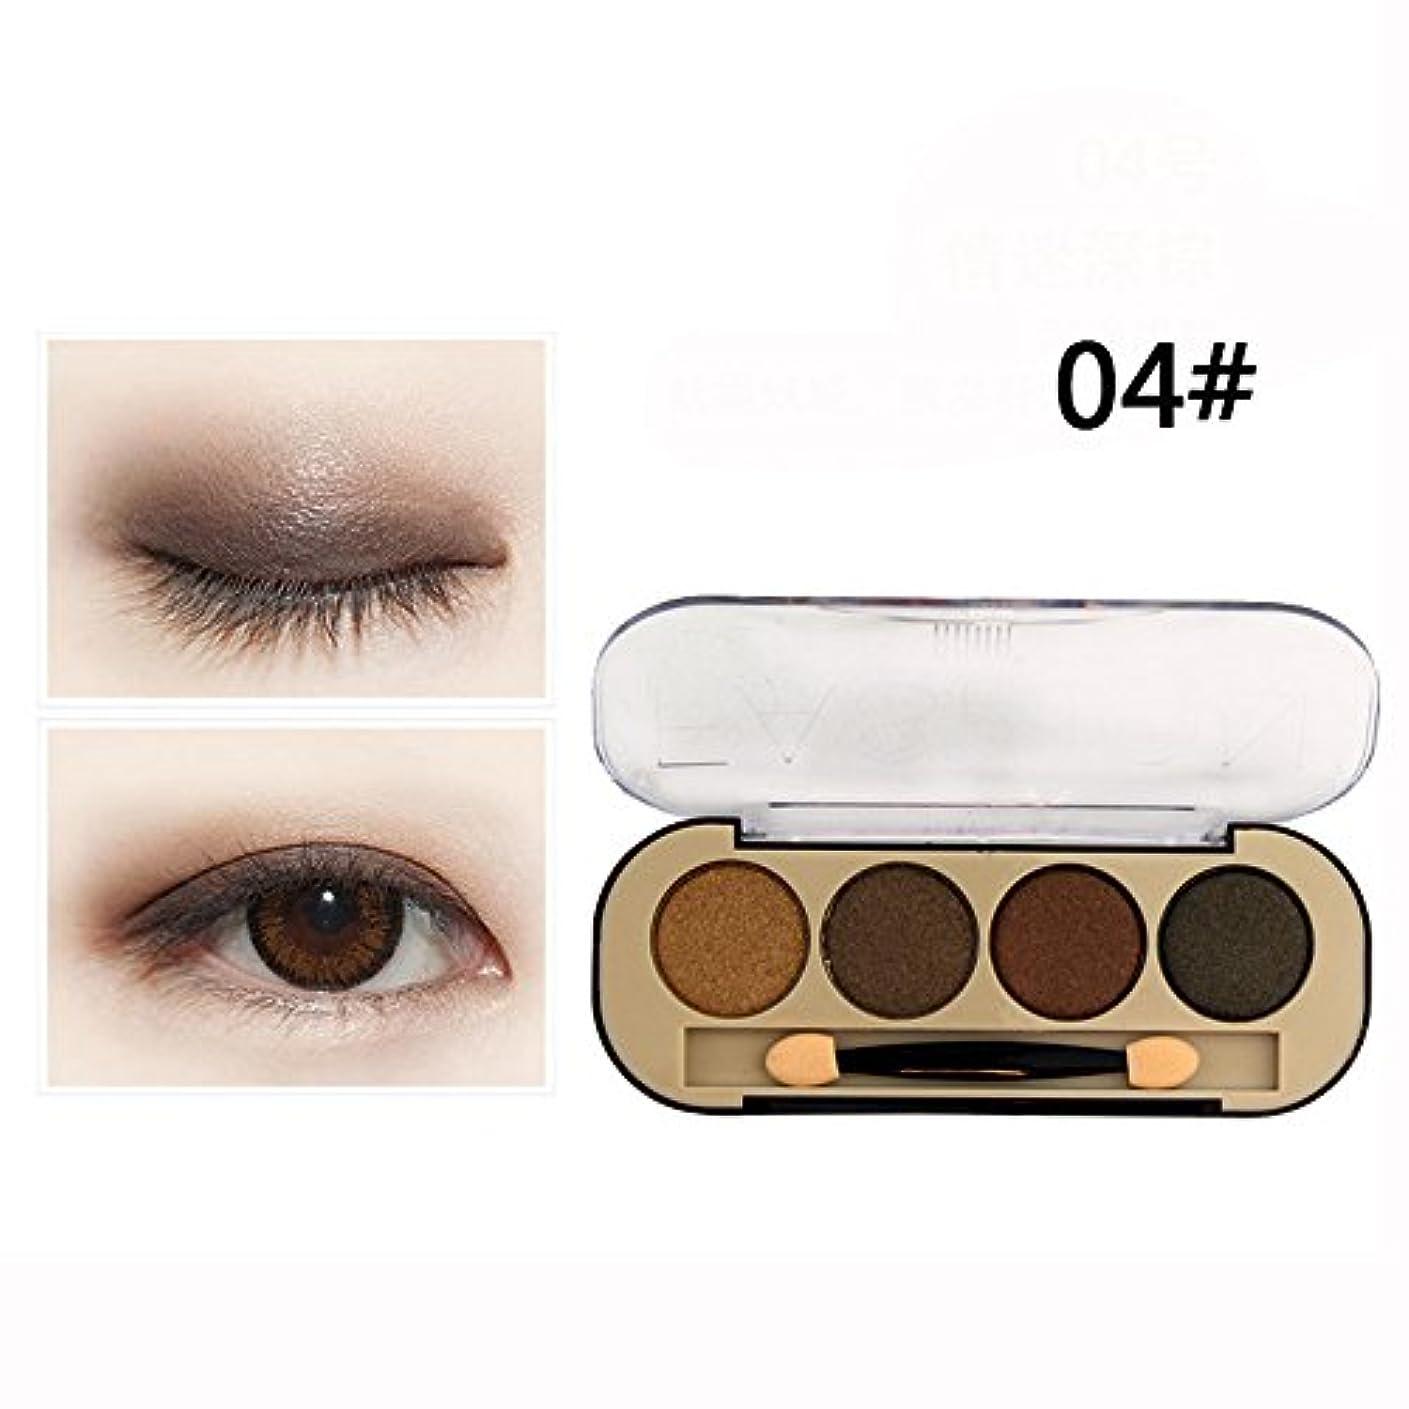 Lazayyii 4色 アイシャドウパレット 化粧ブラシ Eye Shadow グリッターアイシャドウ パール マットマット高発色 透明感 保湿成分 アイシャドウ パレット (04#)